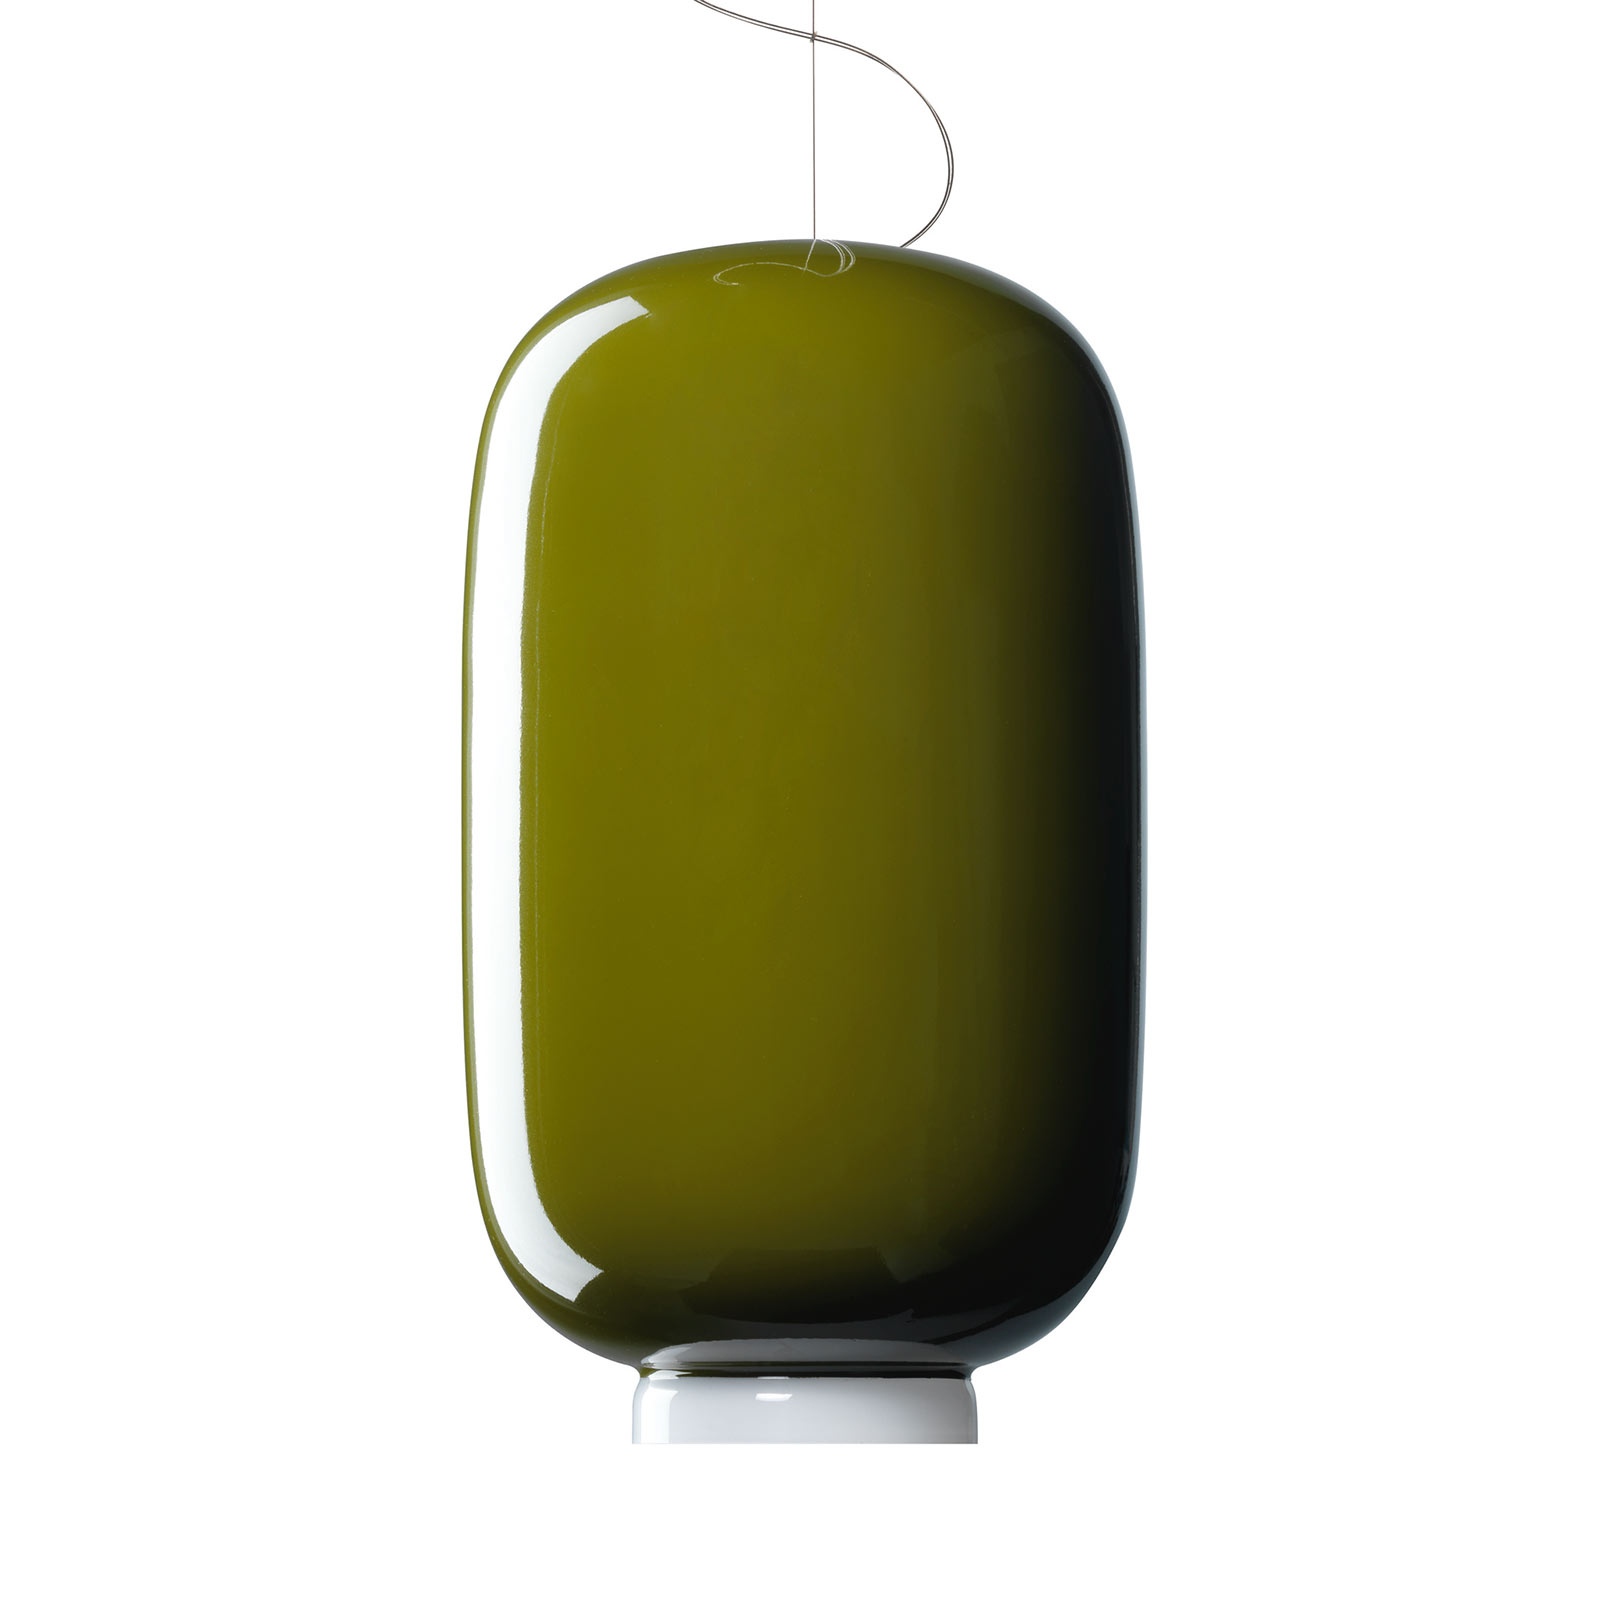 Foscarini Chouchin 2 LED-hængelampe, grøn